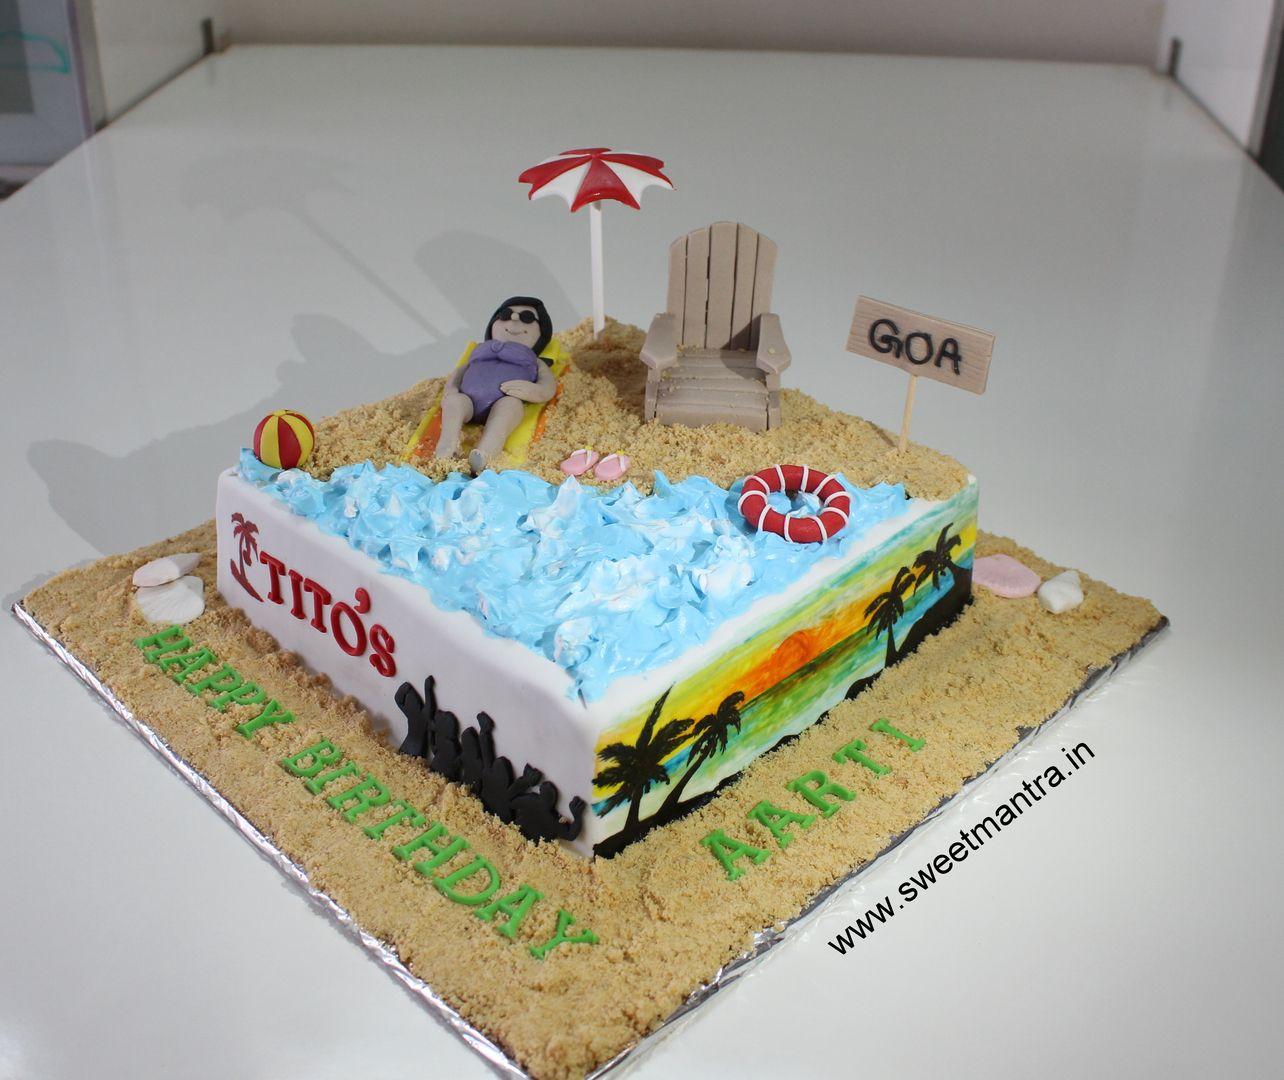 Homemade Eggless 3dcustom Goabeach Theme Birthday Cake For Wife At